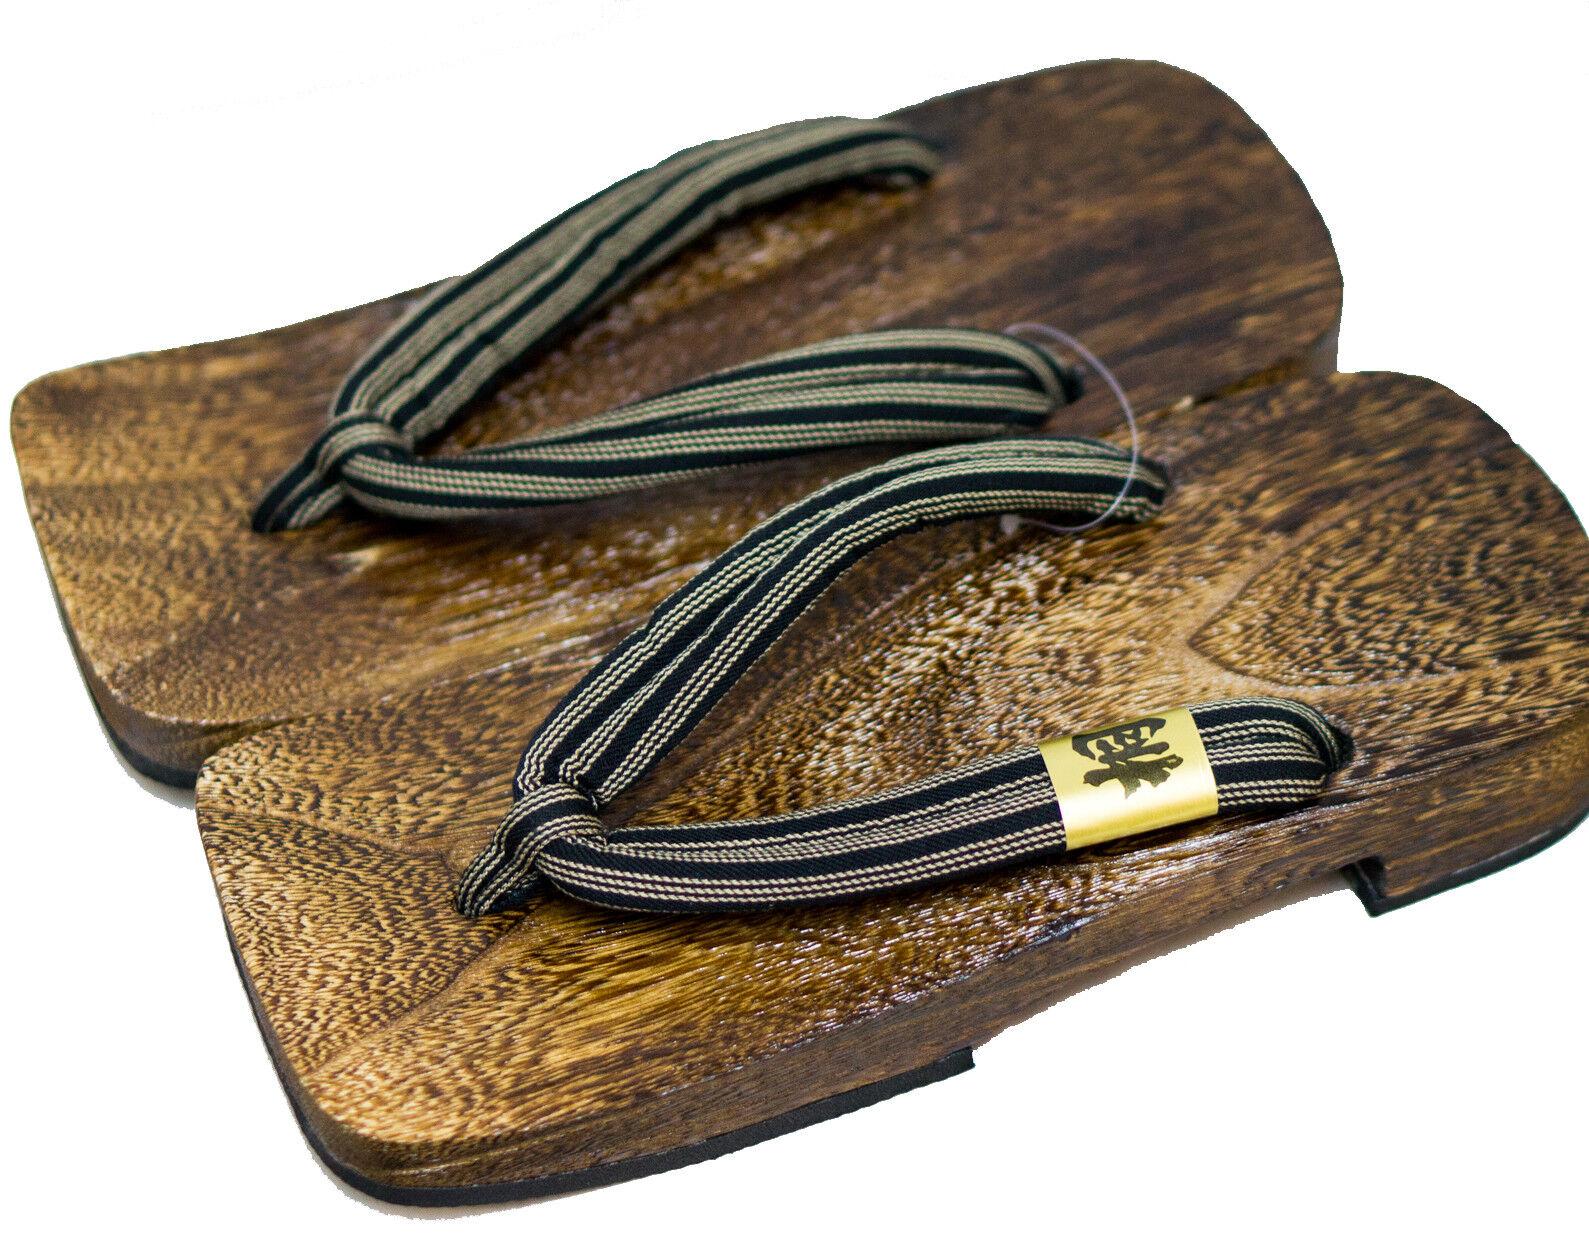 [Japan Made] Uomo Geta Paulownia Paulownia Paulownia Wood Sandals Traditional 30cm, Stripe 6921 c6091a